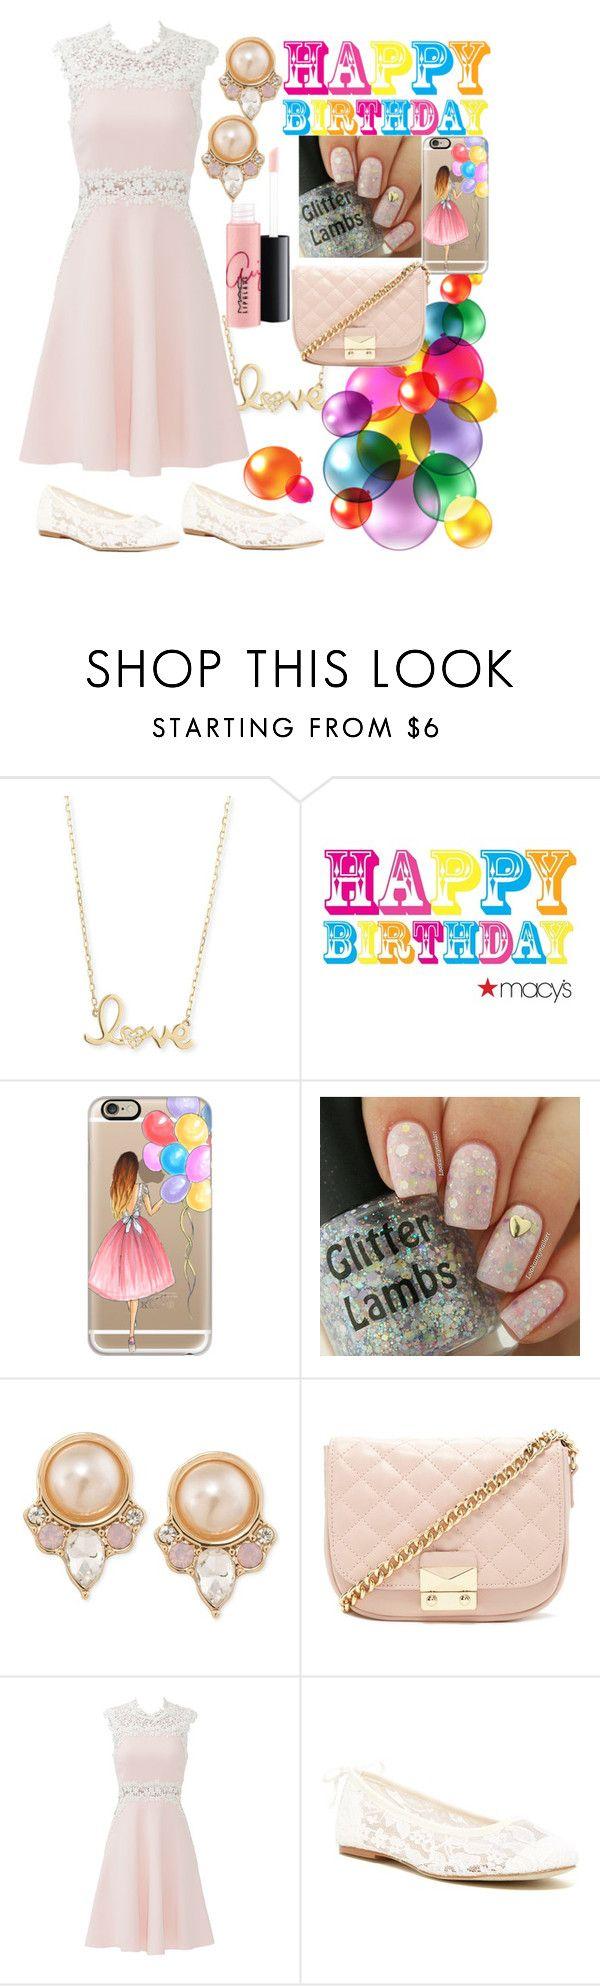 """It's My Birthday!!!"" by unicorn-mc-rainbow ❤ liked on Polyvore featuring Sydney Evan, Casetify, Carolee, Forever 21, Giambattista Valli, Soludos and MAC Cosmetics"